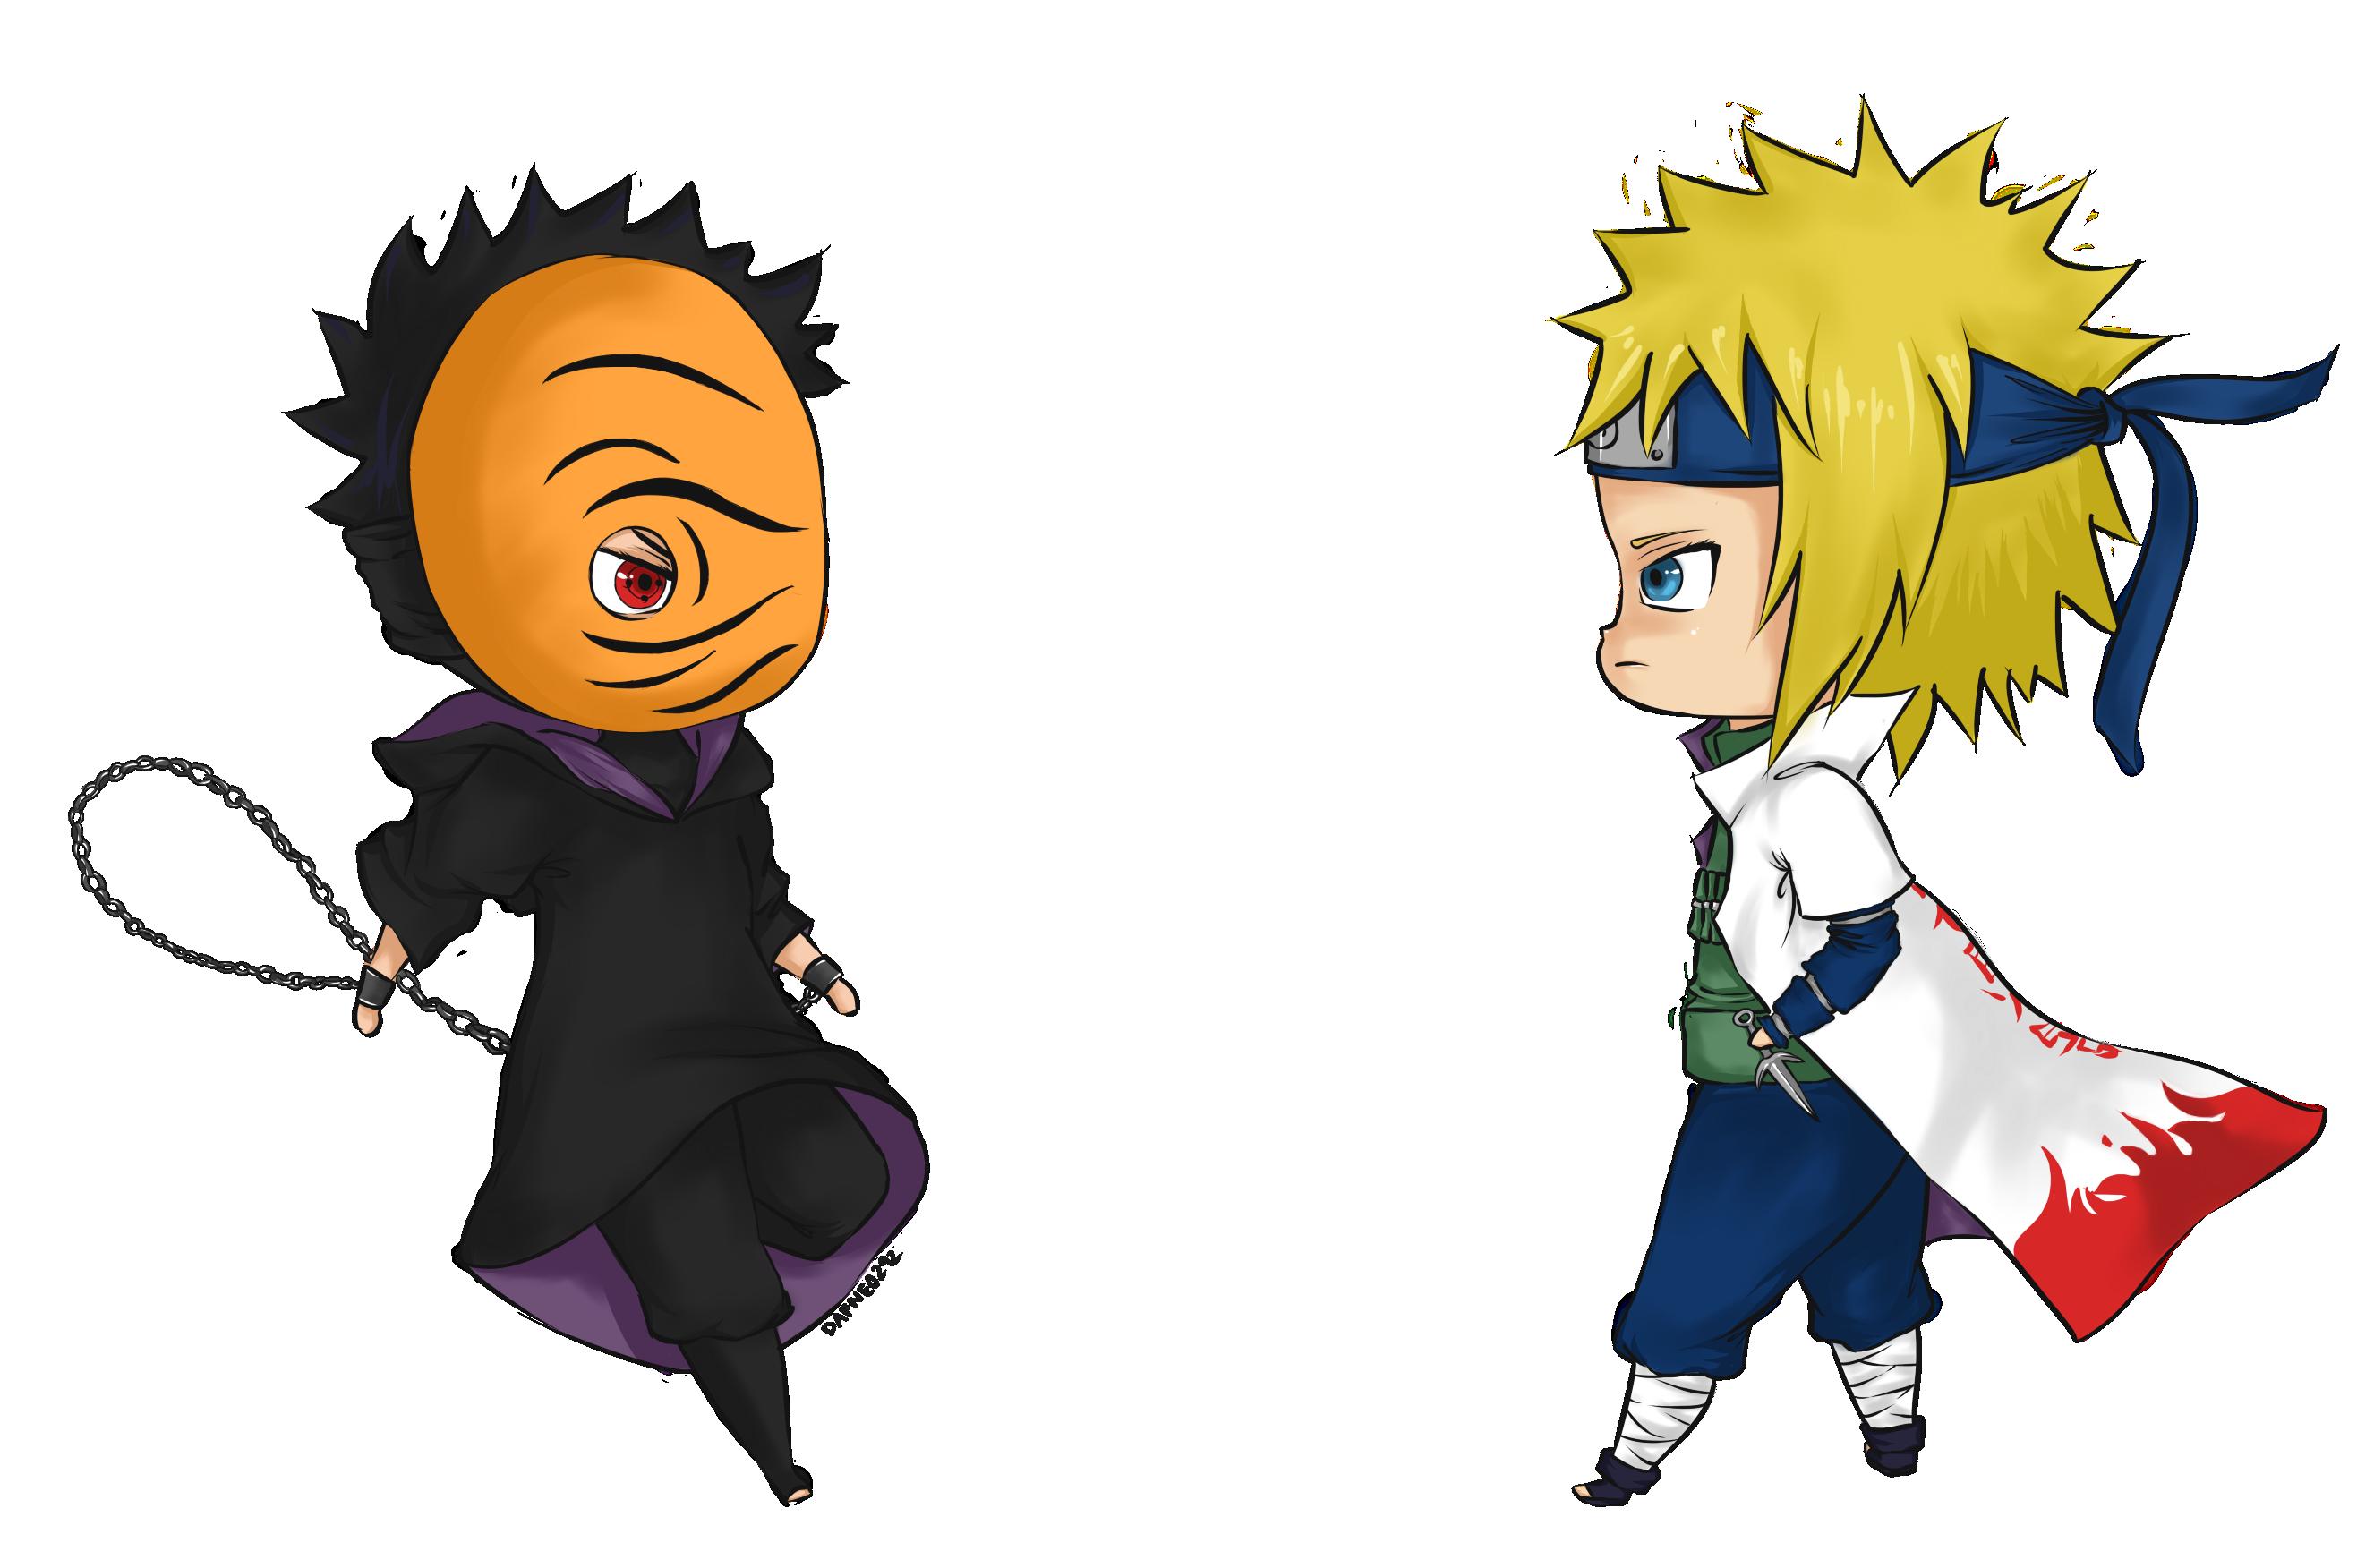 tobi vs minato by dafne0292 on deviantart